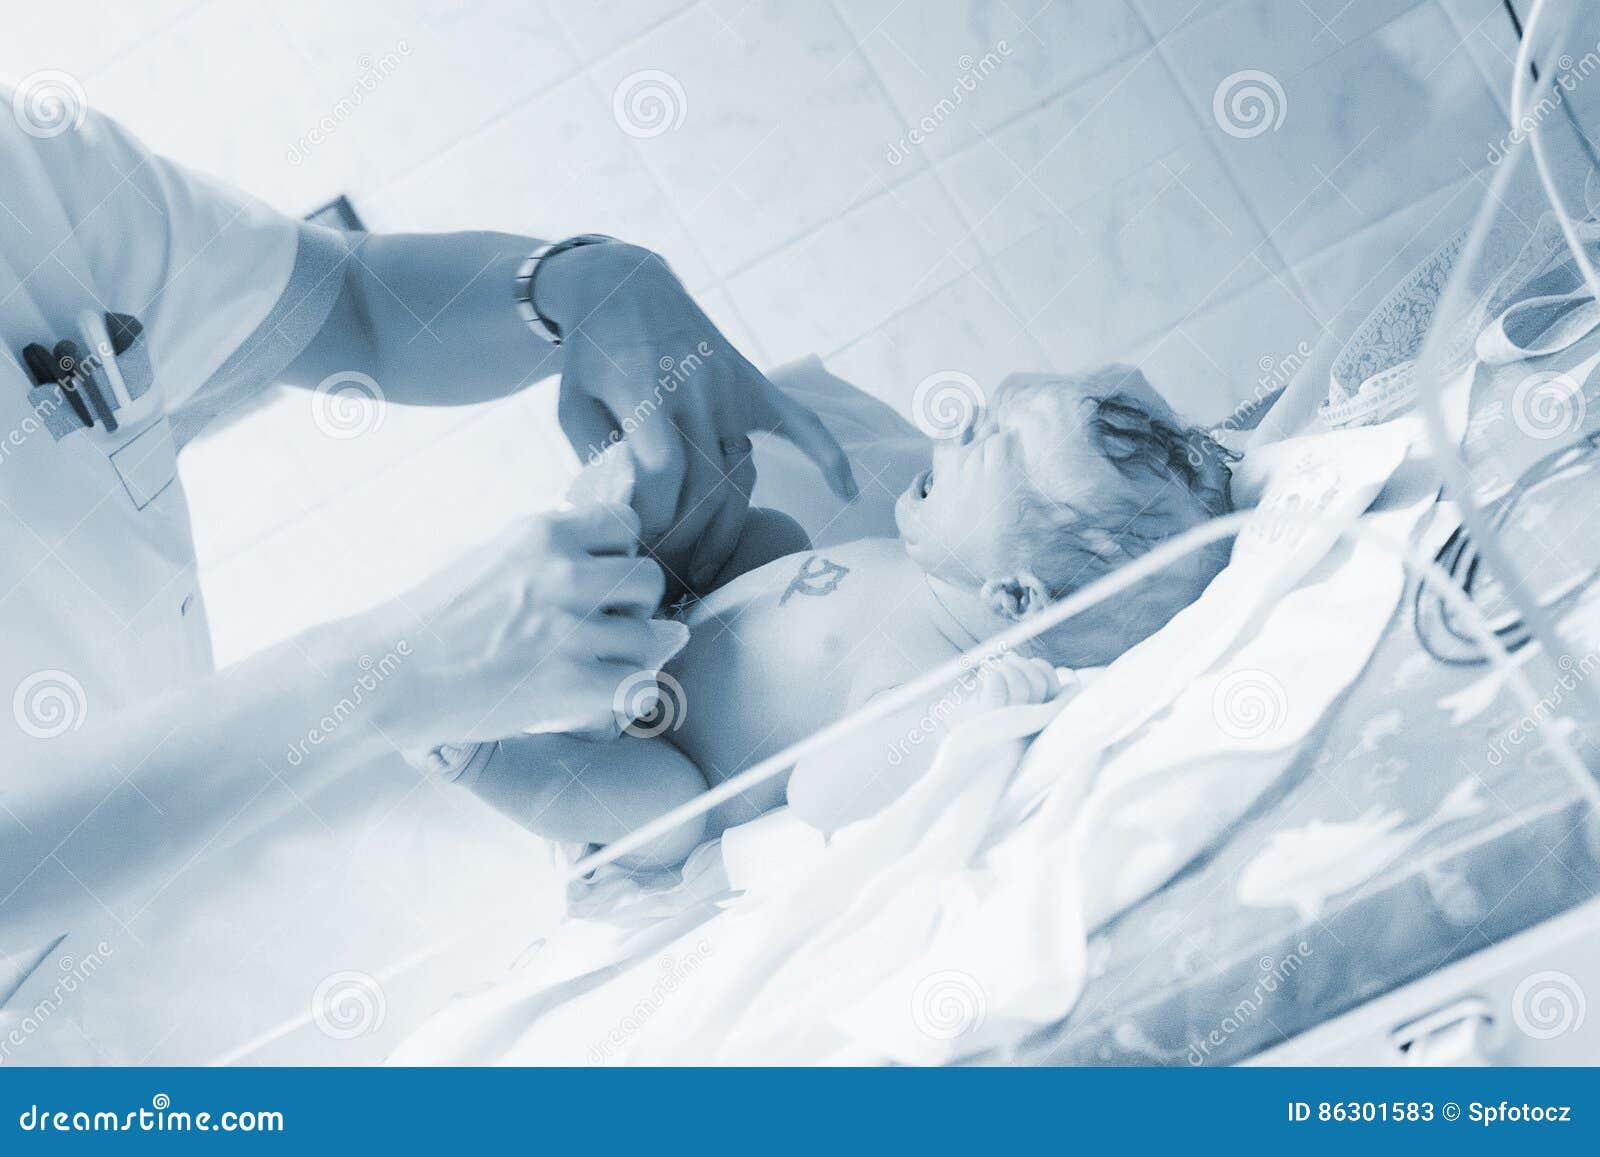 Feel My Baby Feel My Love Stock Image Image Of Dream 86301583